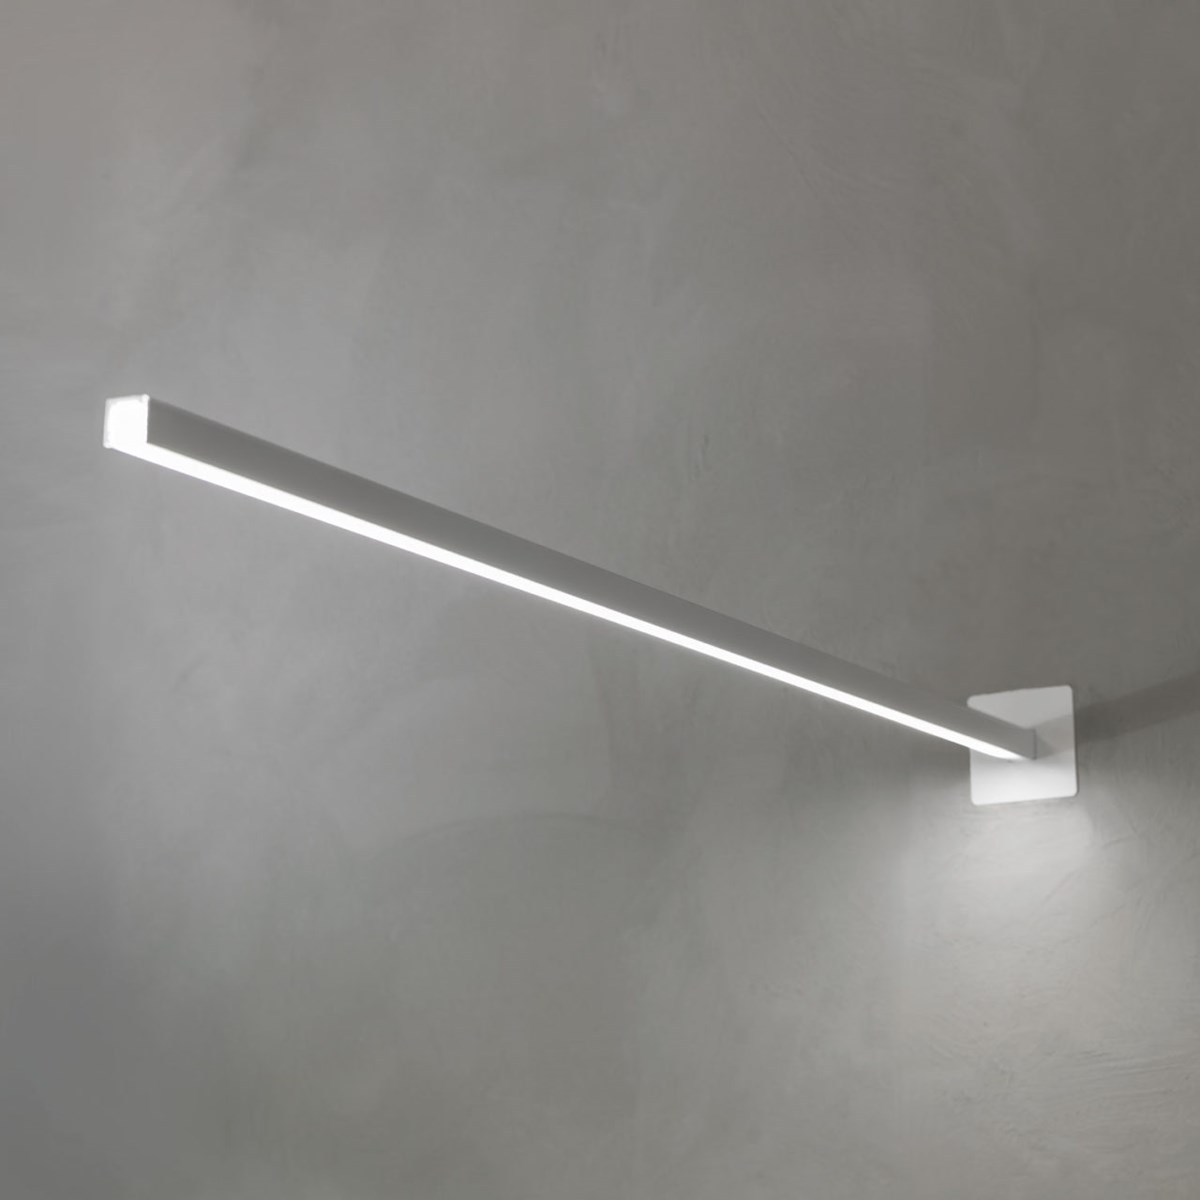 Nemo-Nemo-Design-Linescapes-Cantilevered-Light-Matisse-2